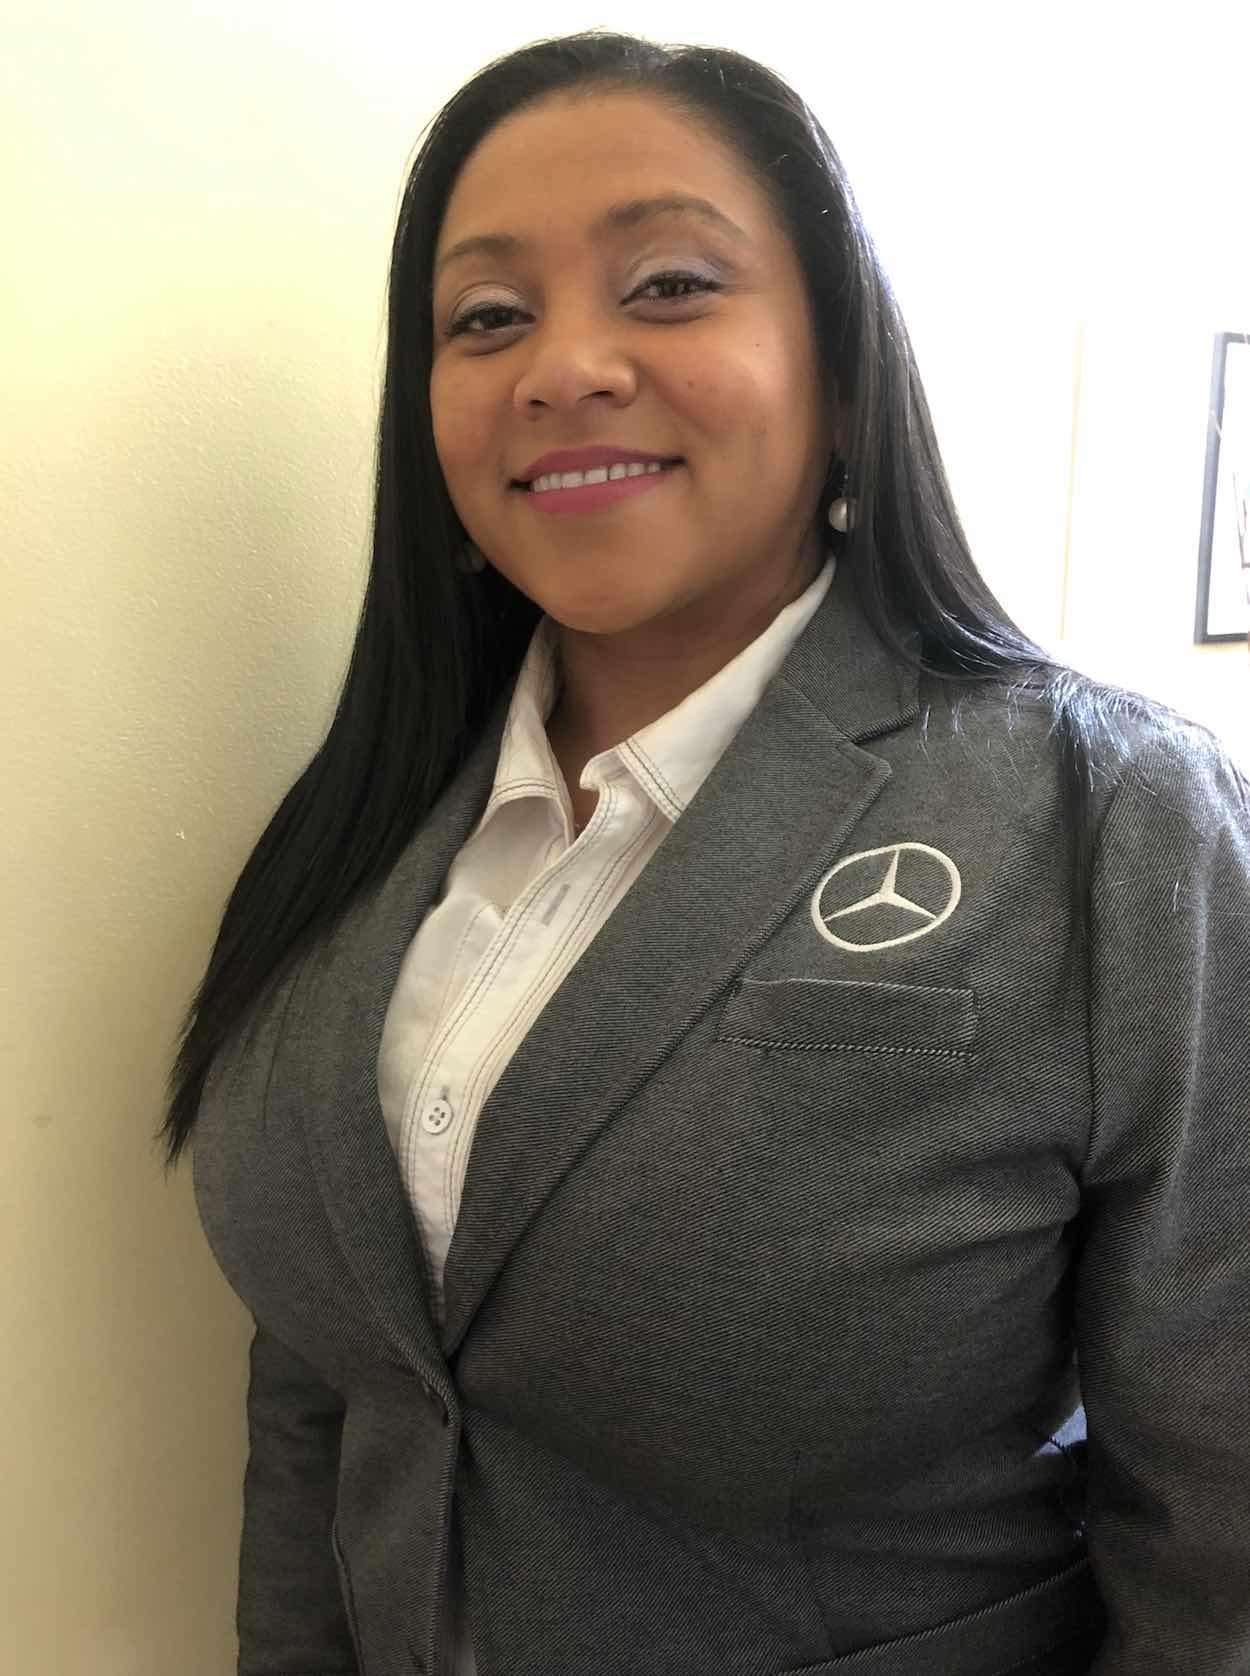 Antoinette Gordon-Hessing: Customer Experience Manager at Mercedes Benz of Rockville Center